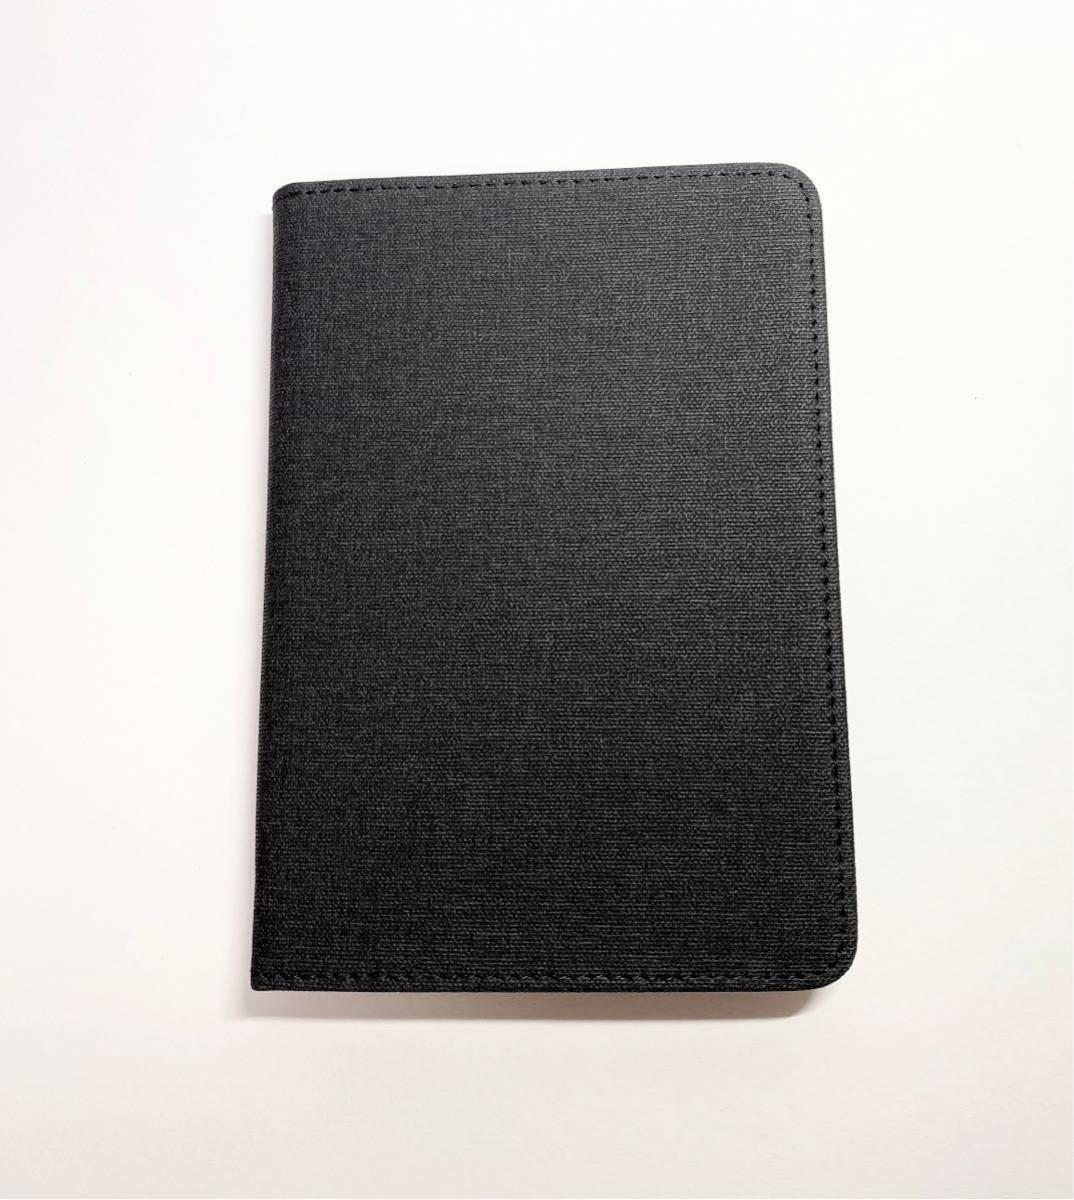 Kindle Paperwhite 全世代通用の保護カバー ケース ブラック